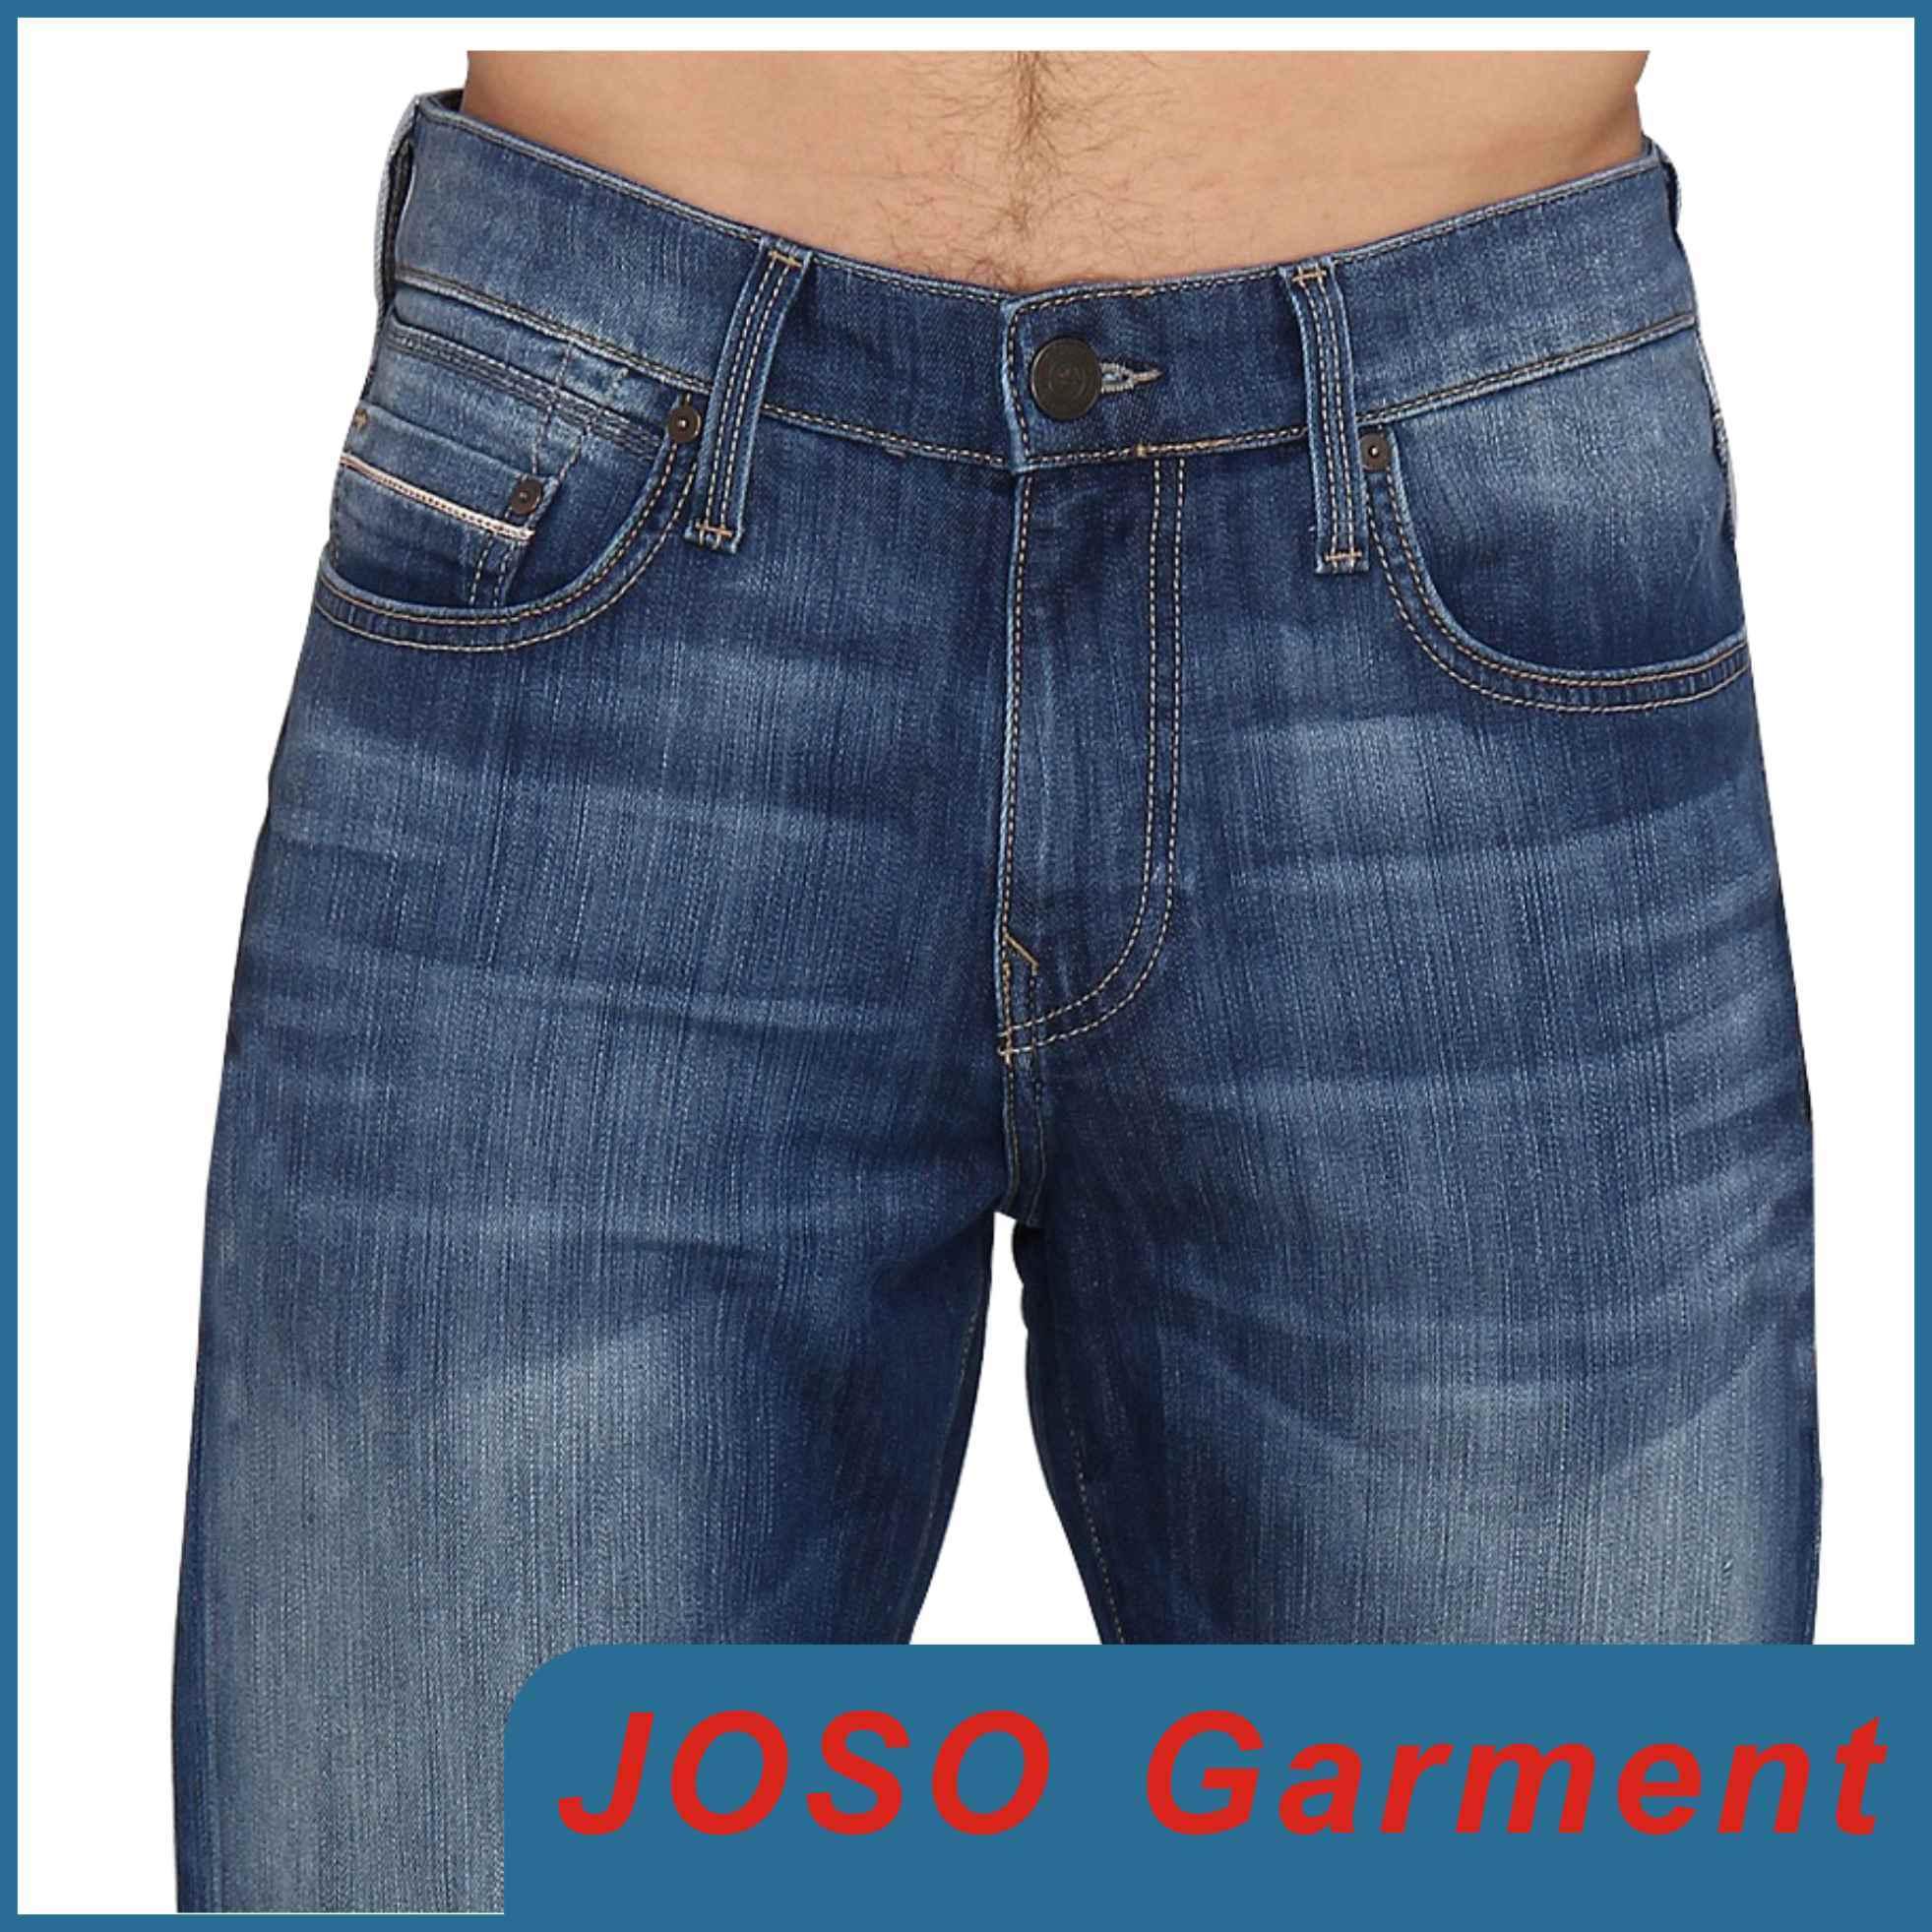 Popular Men Casual Denim Jeans (JC3030)